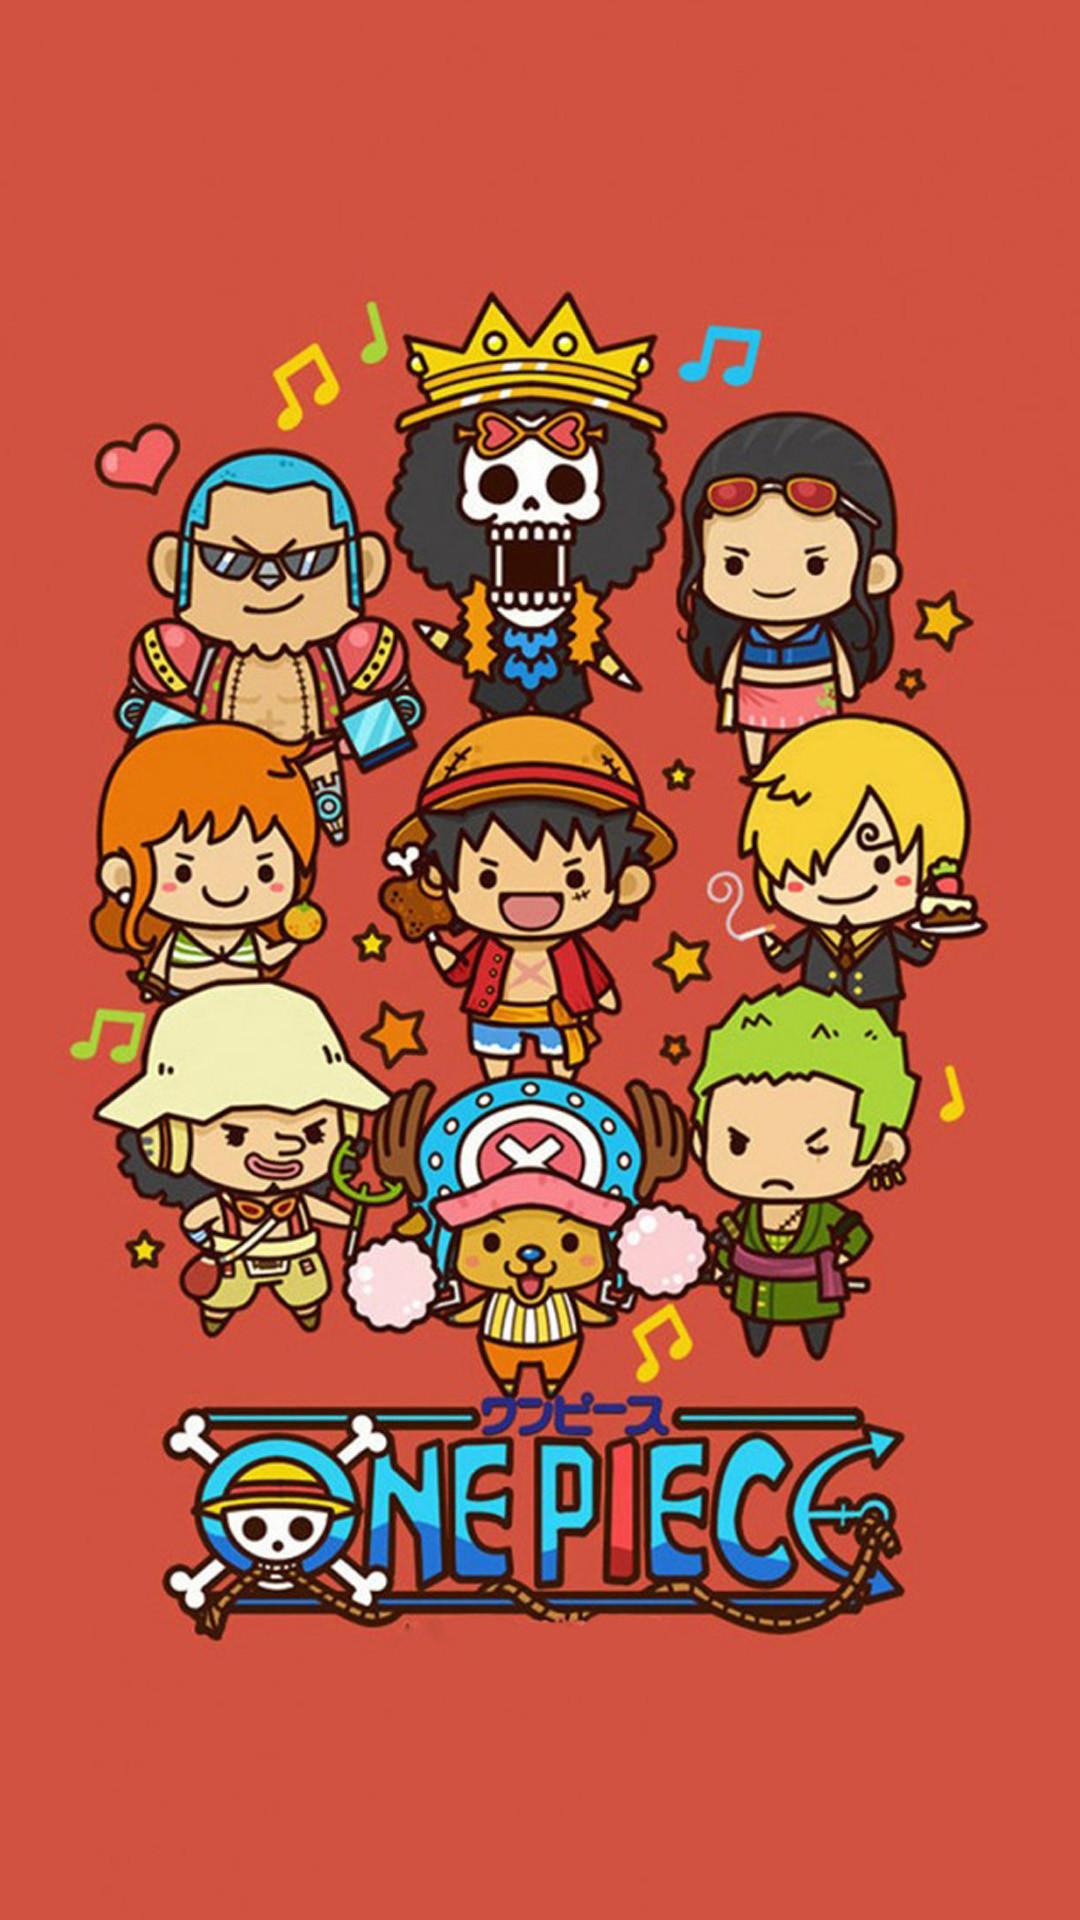 Cute Lovely One Piece Cartoon Poster iPhone 6 wallpaper